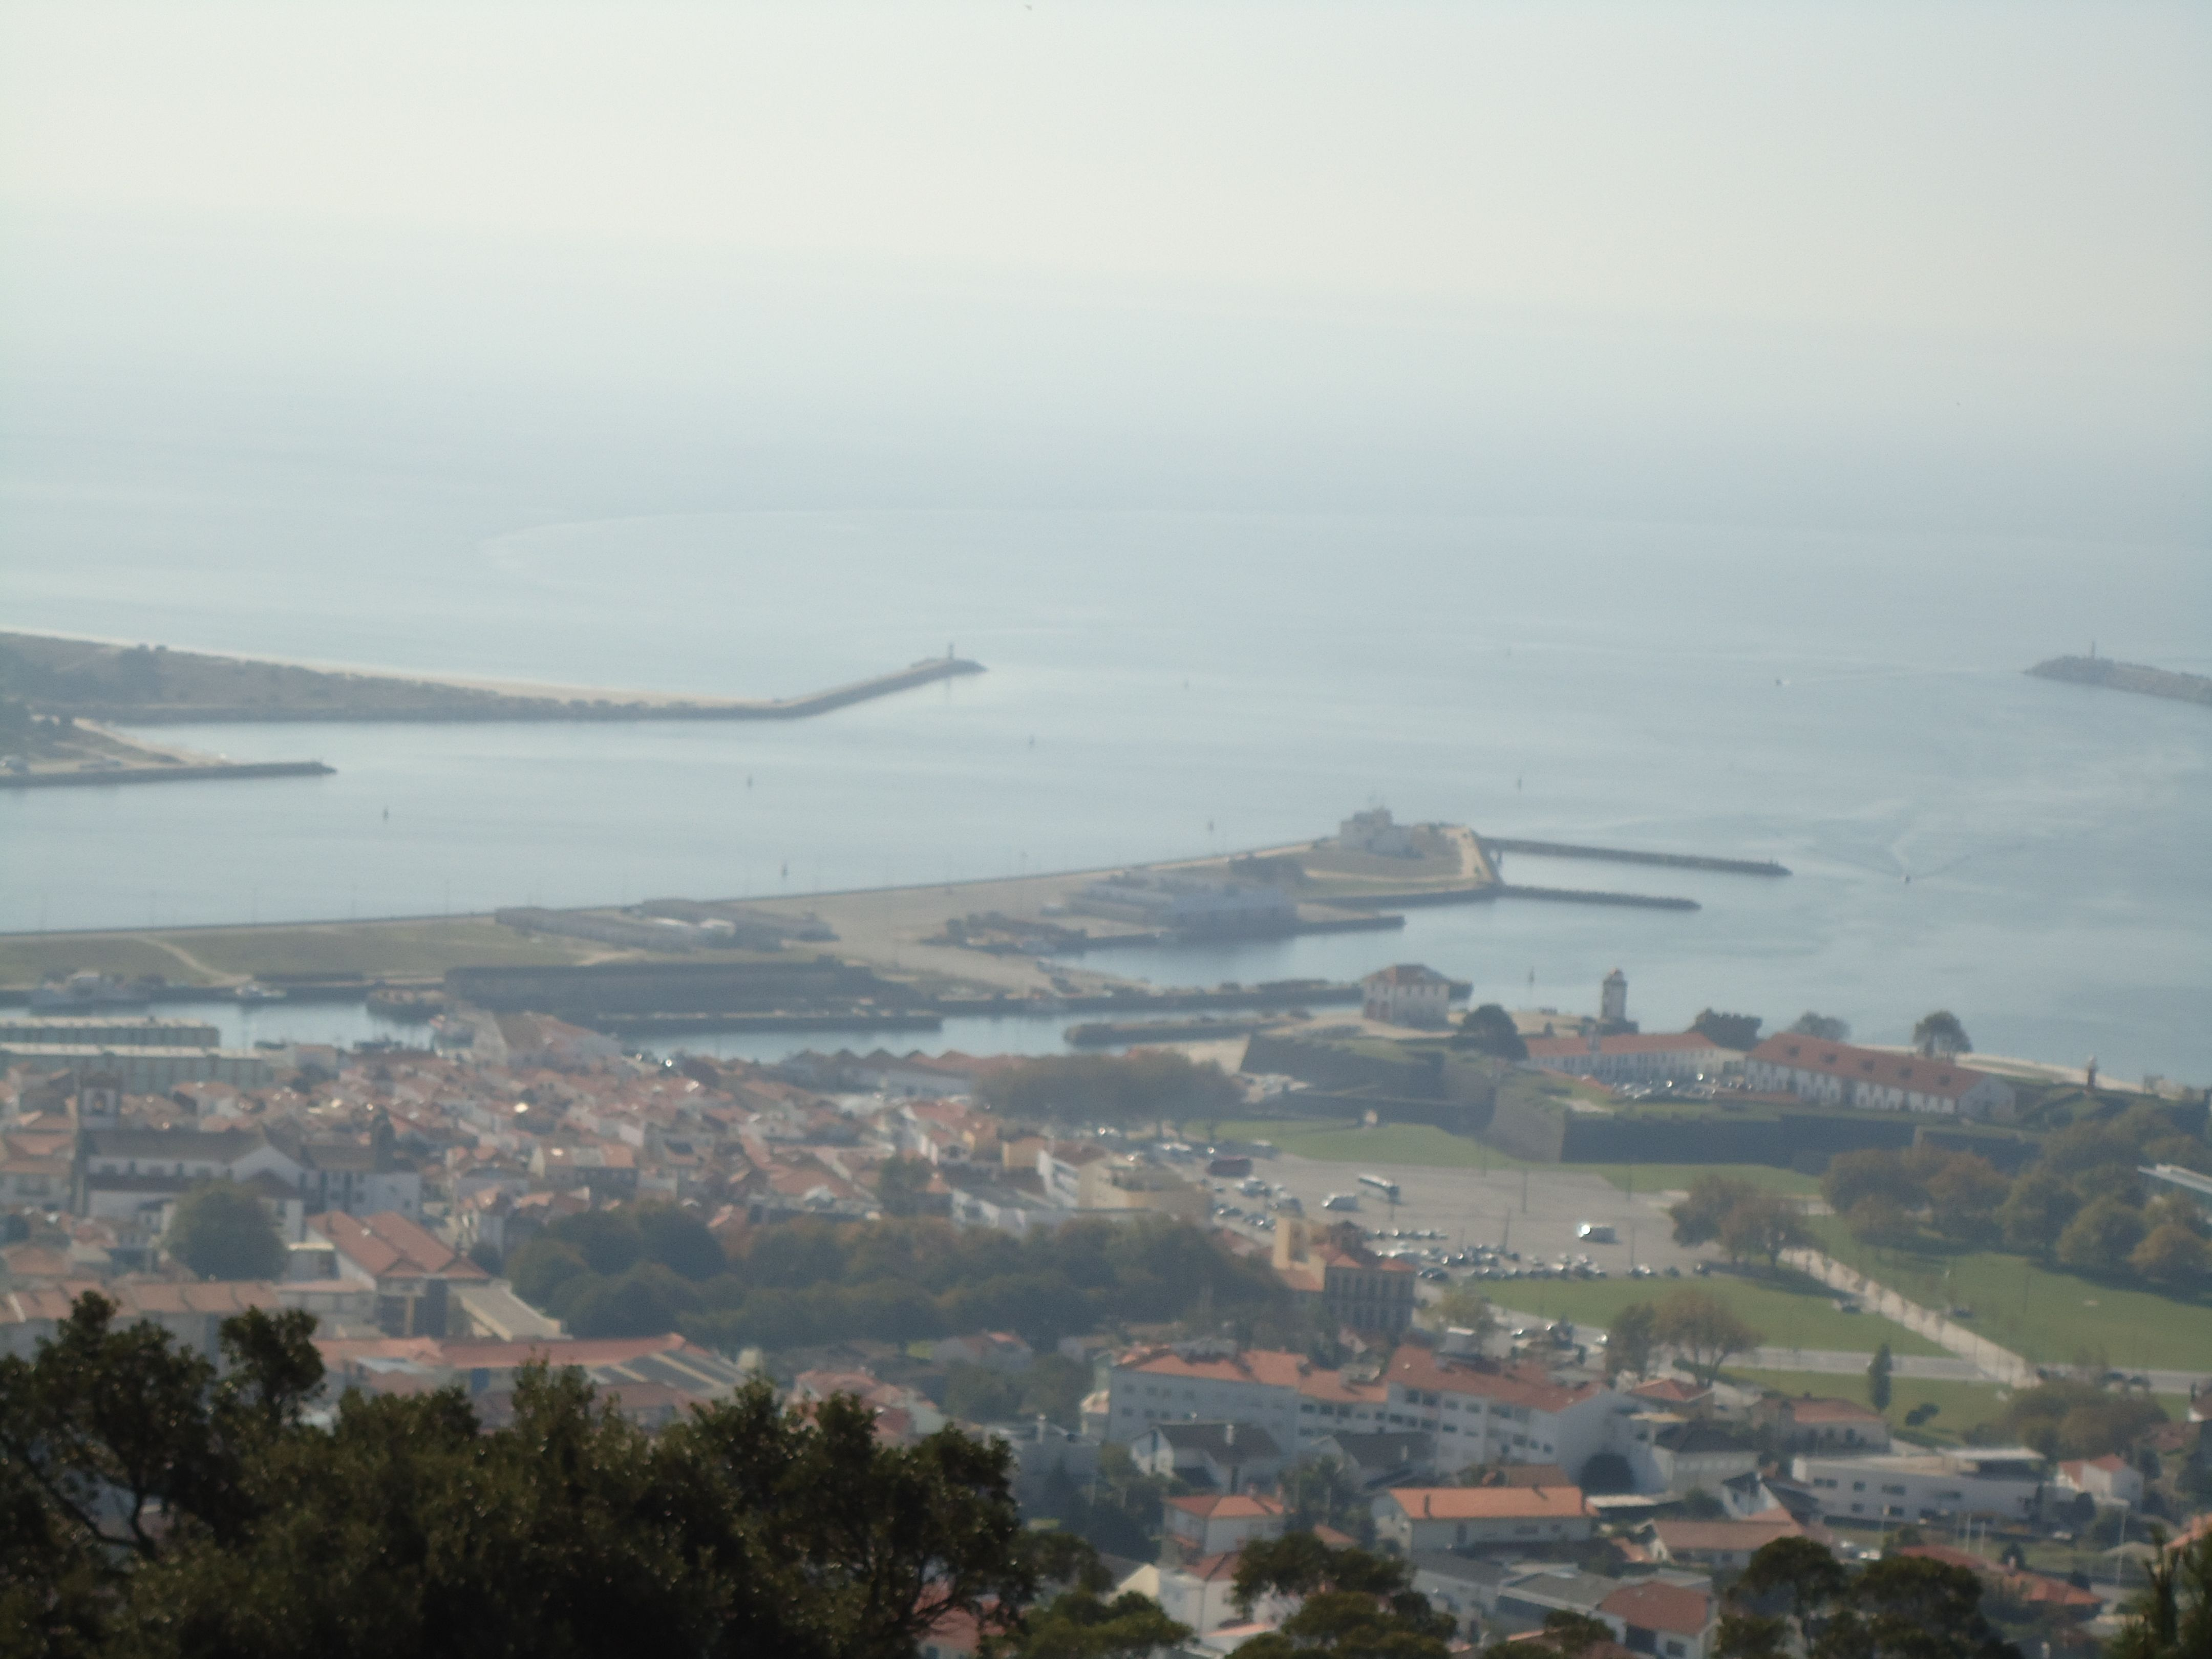 Viana do castelo portugal viana pinterest - Viana do castelo portugal ...